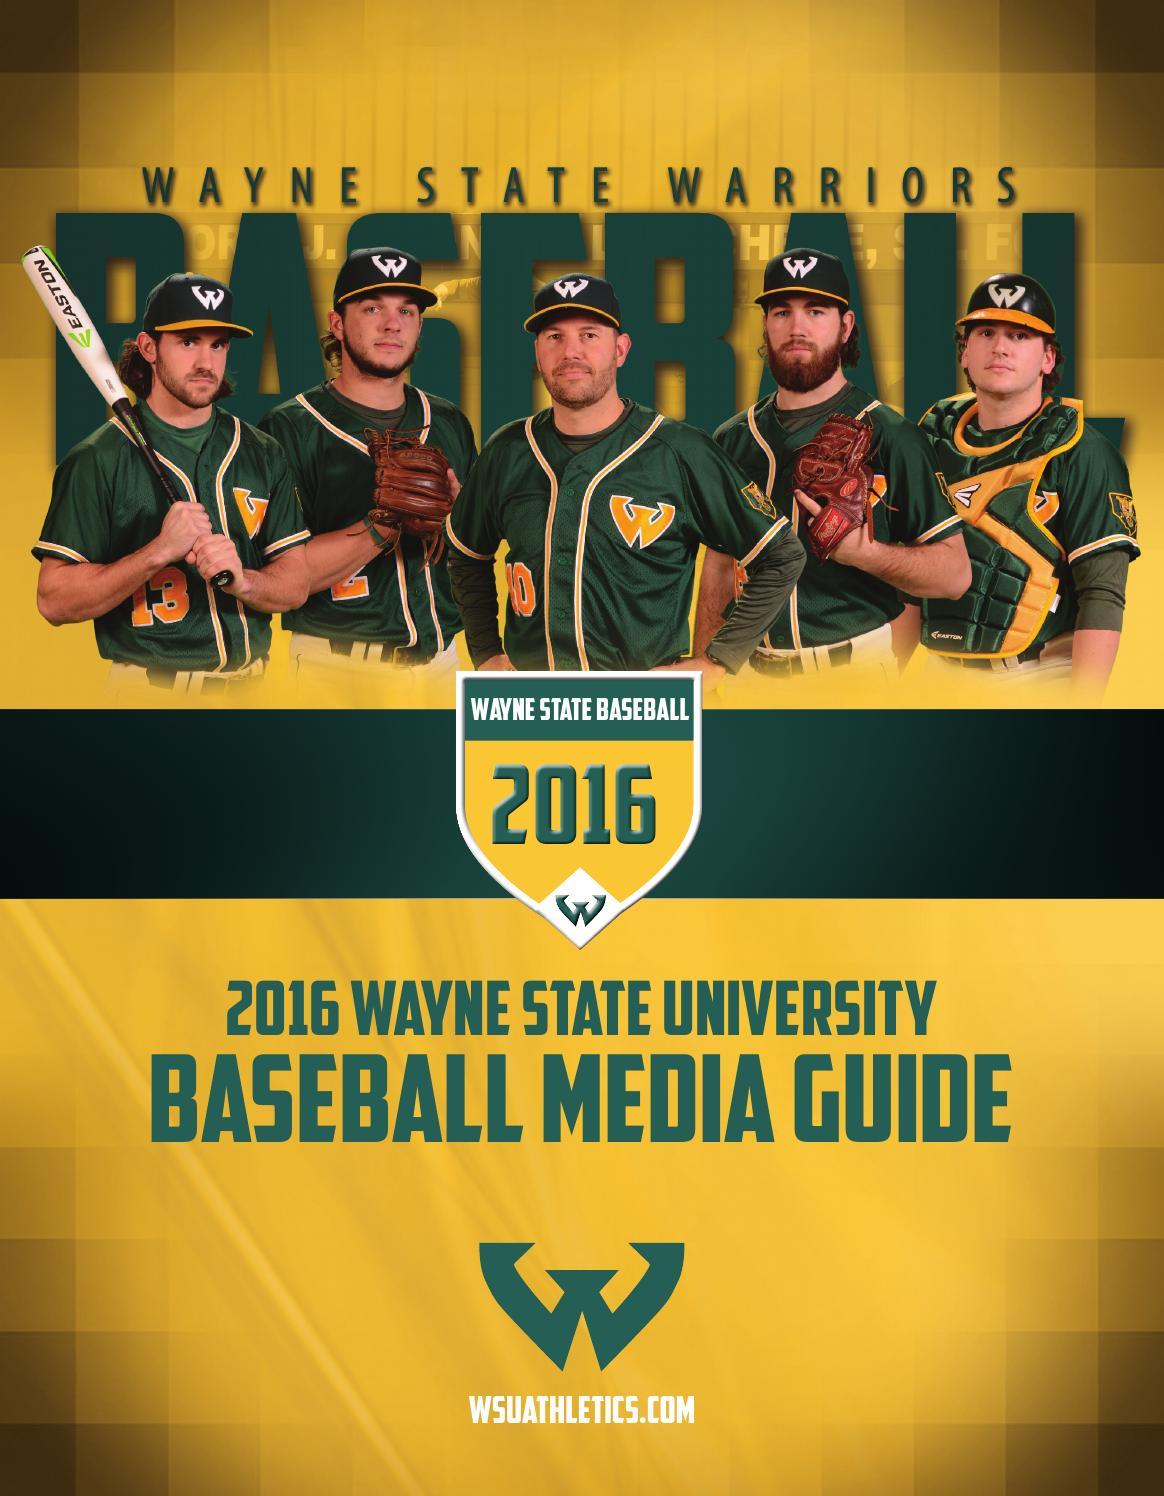 2016 Wayne State University Baseball Media Guide By Wayne State University Warriors Issuu